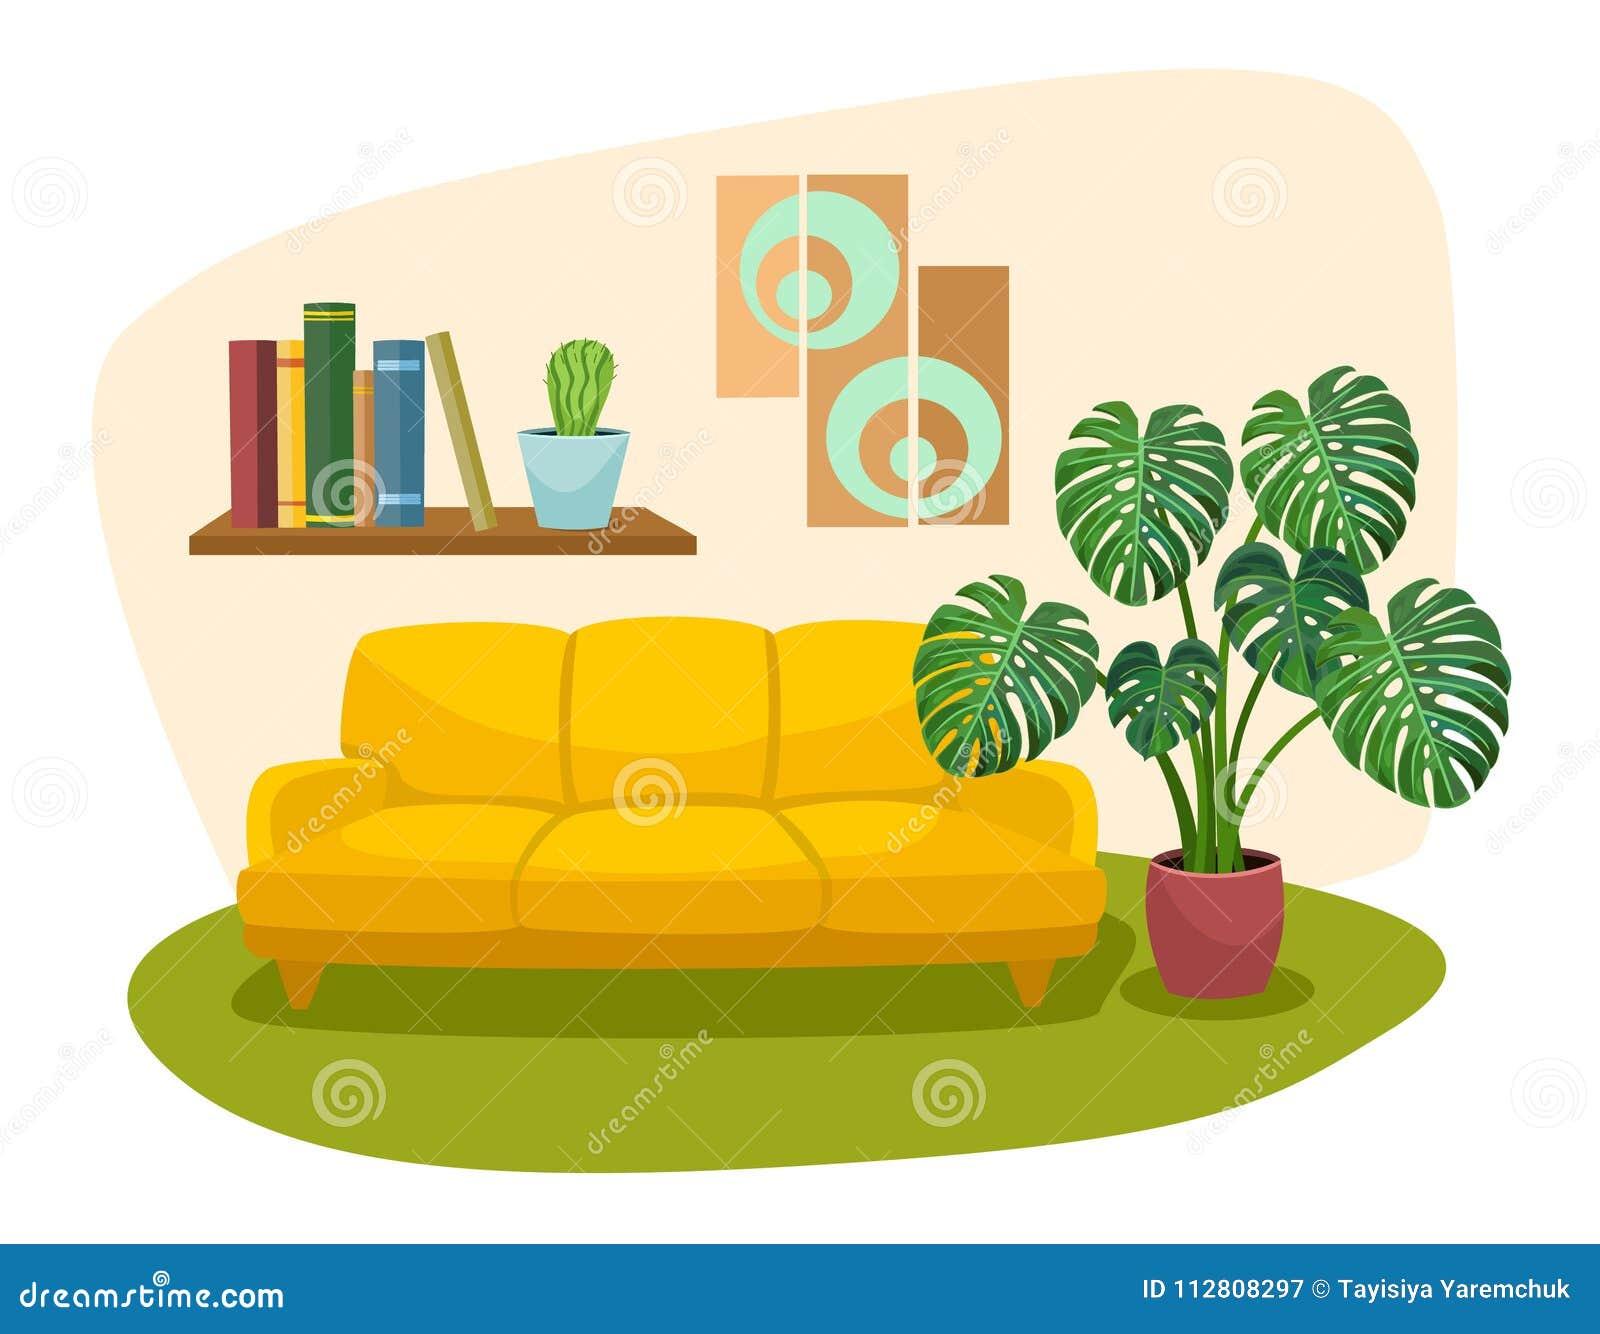 Living Room Interior Design With Sofa Bookshelf And Tropical Plant Vector Illustration